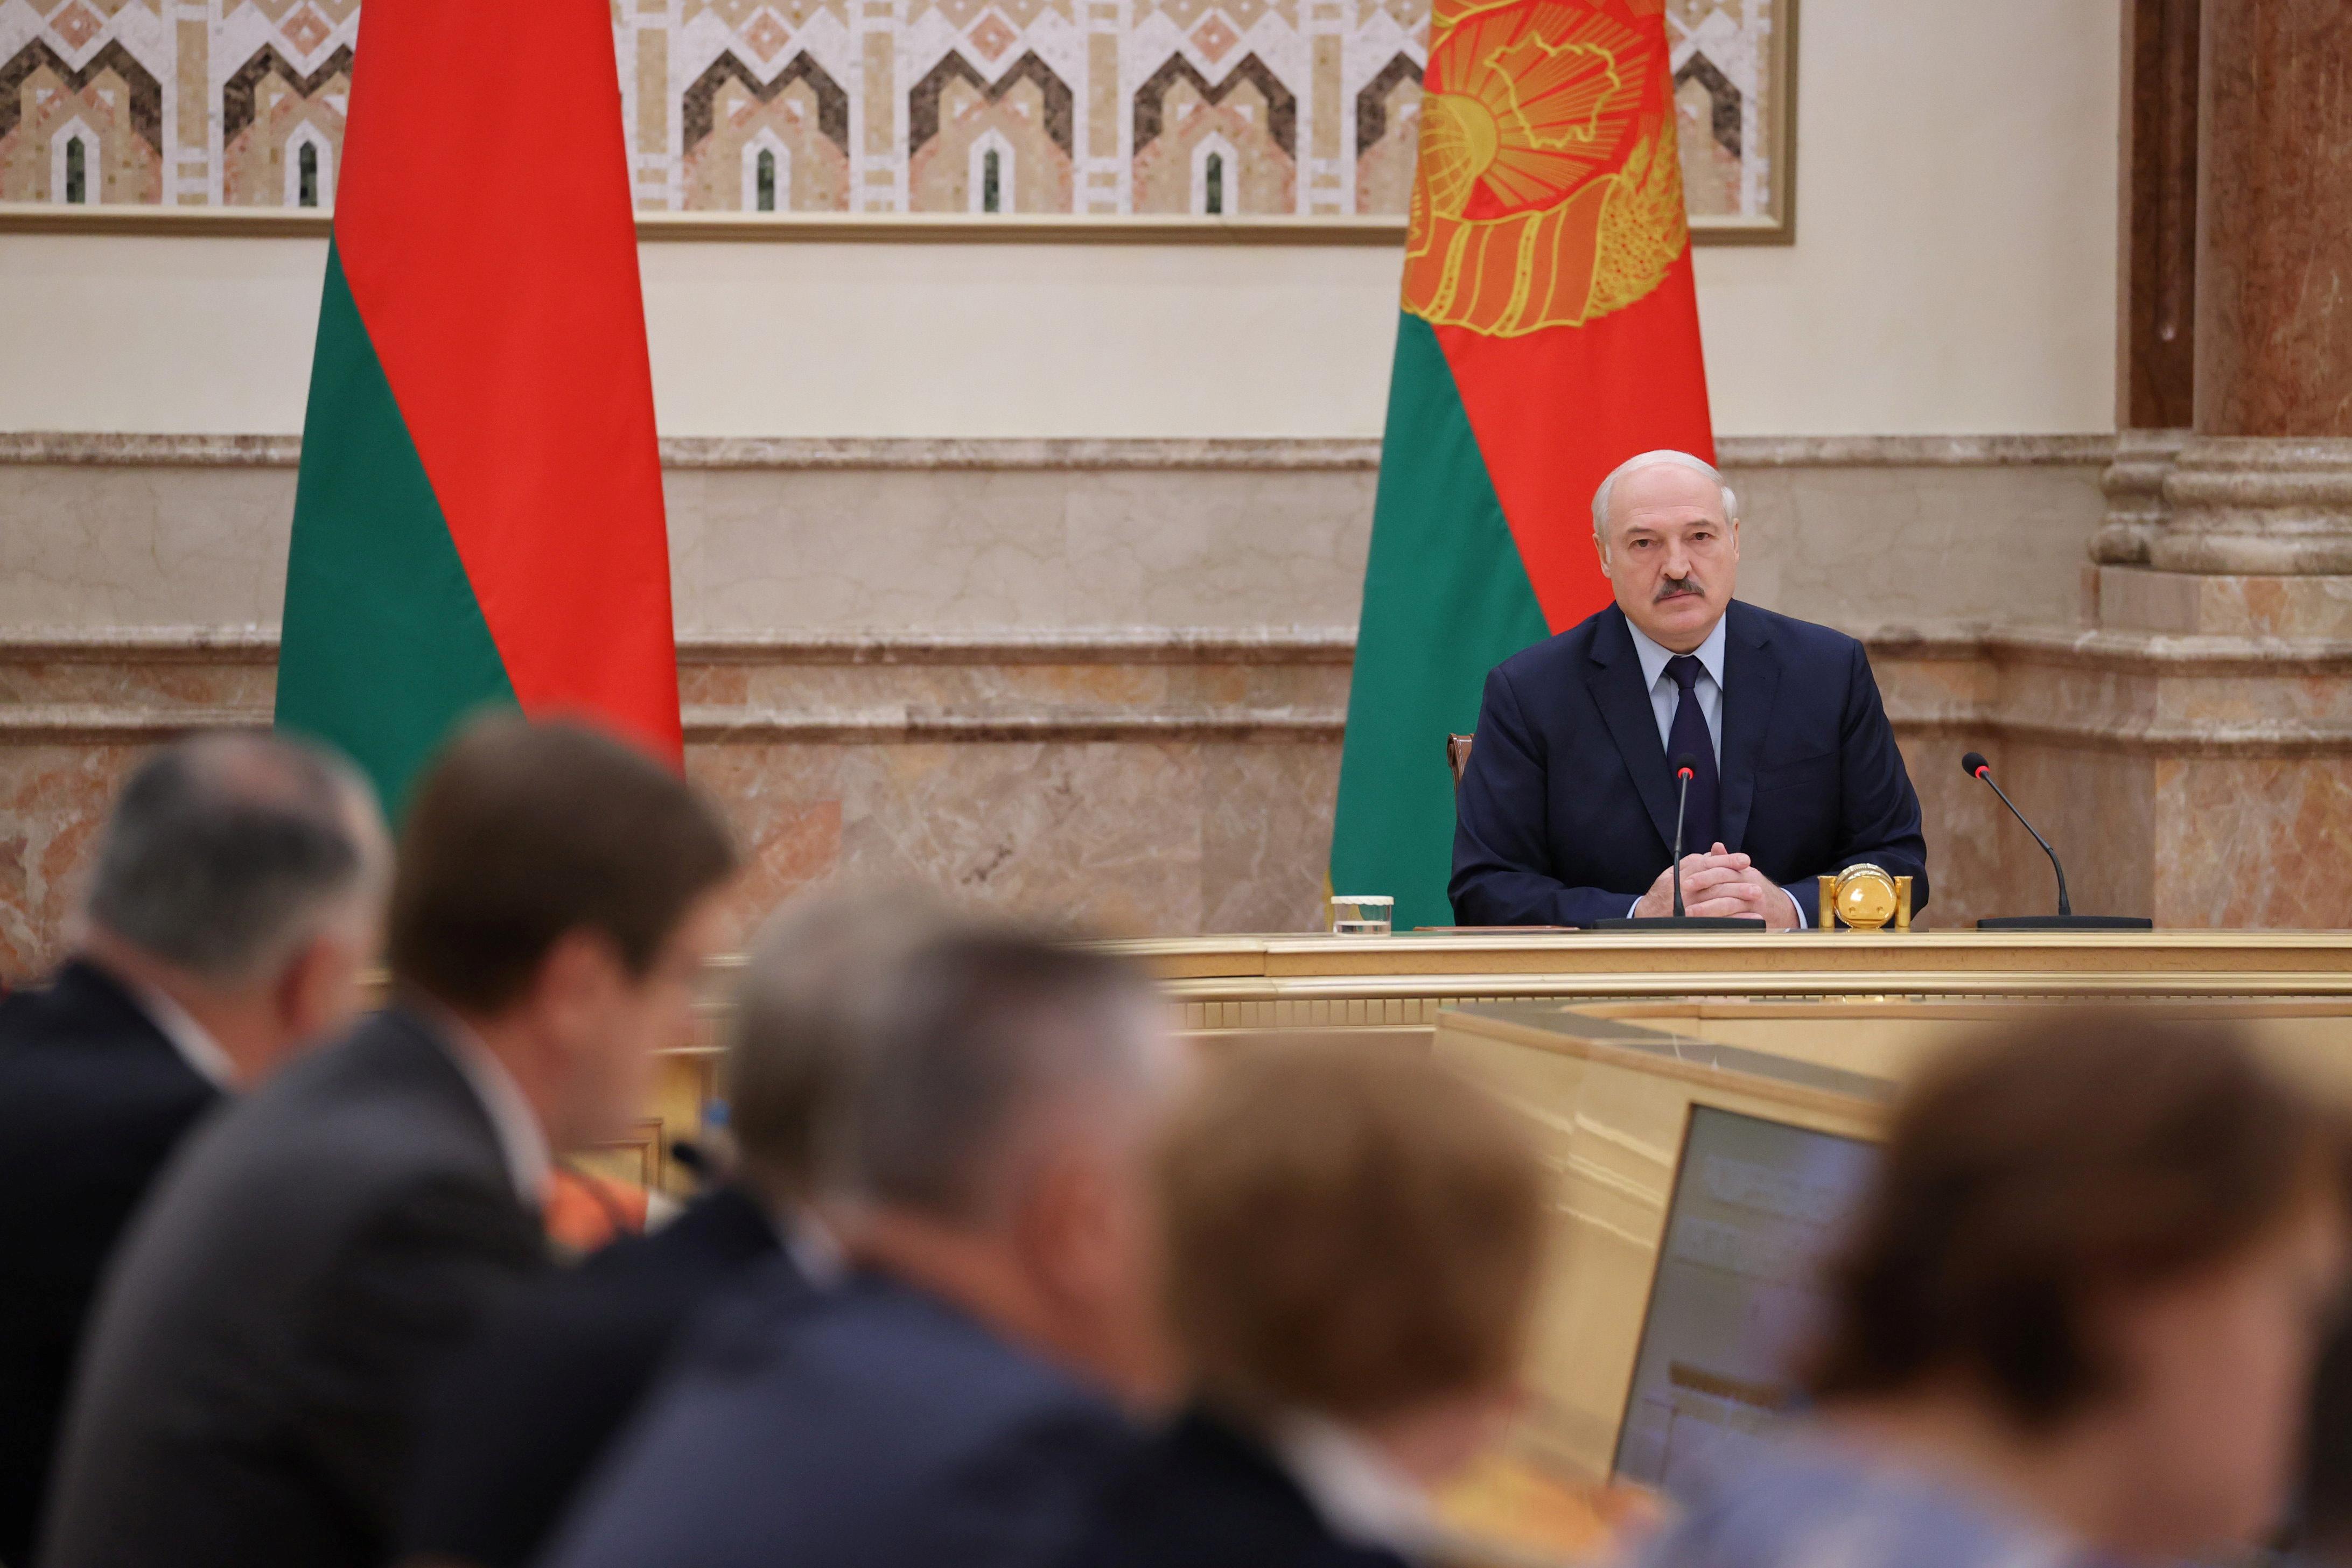 Belarusian President Alexander Lukashenko attends a meeting of the Constitutional Commission in Minsk, Belarus September 28, 2021. Maxim Guchek/BelTA/Handout via REUTERS